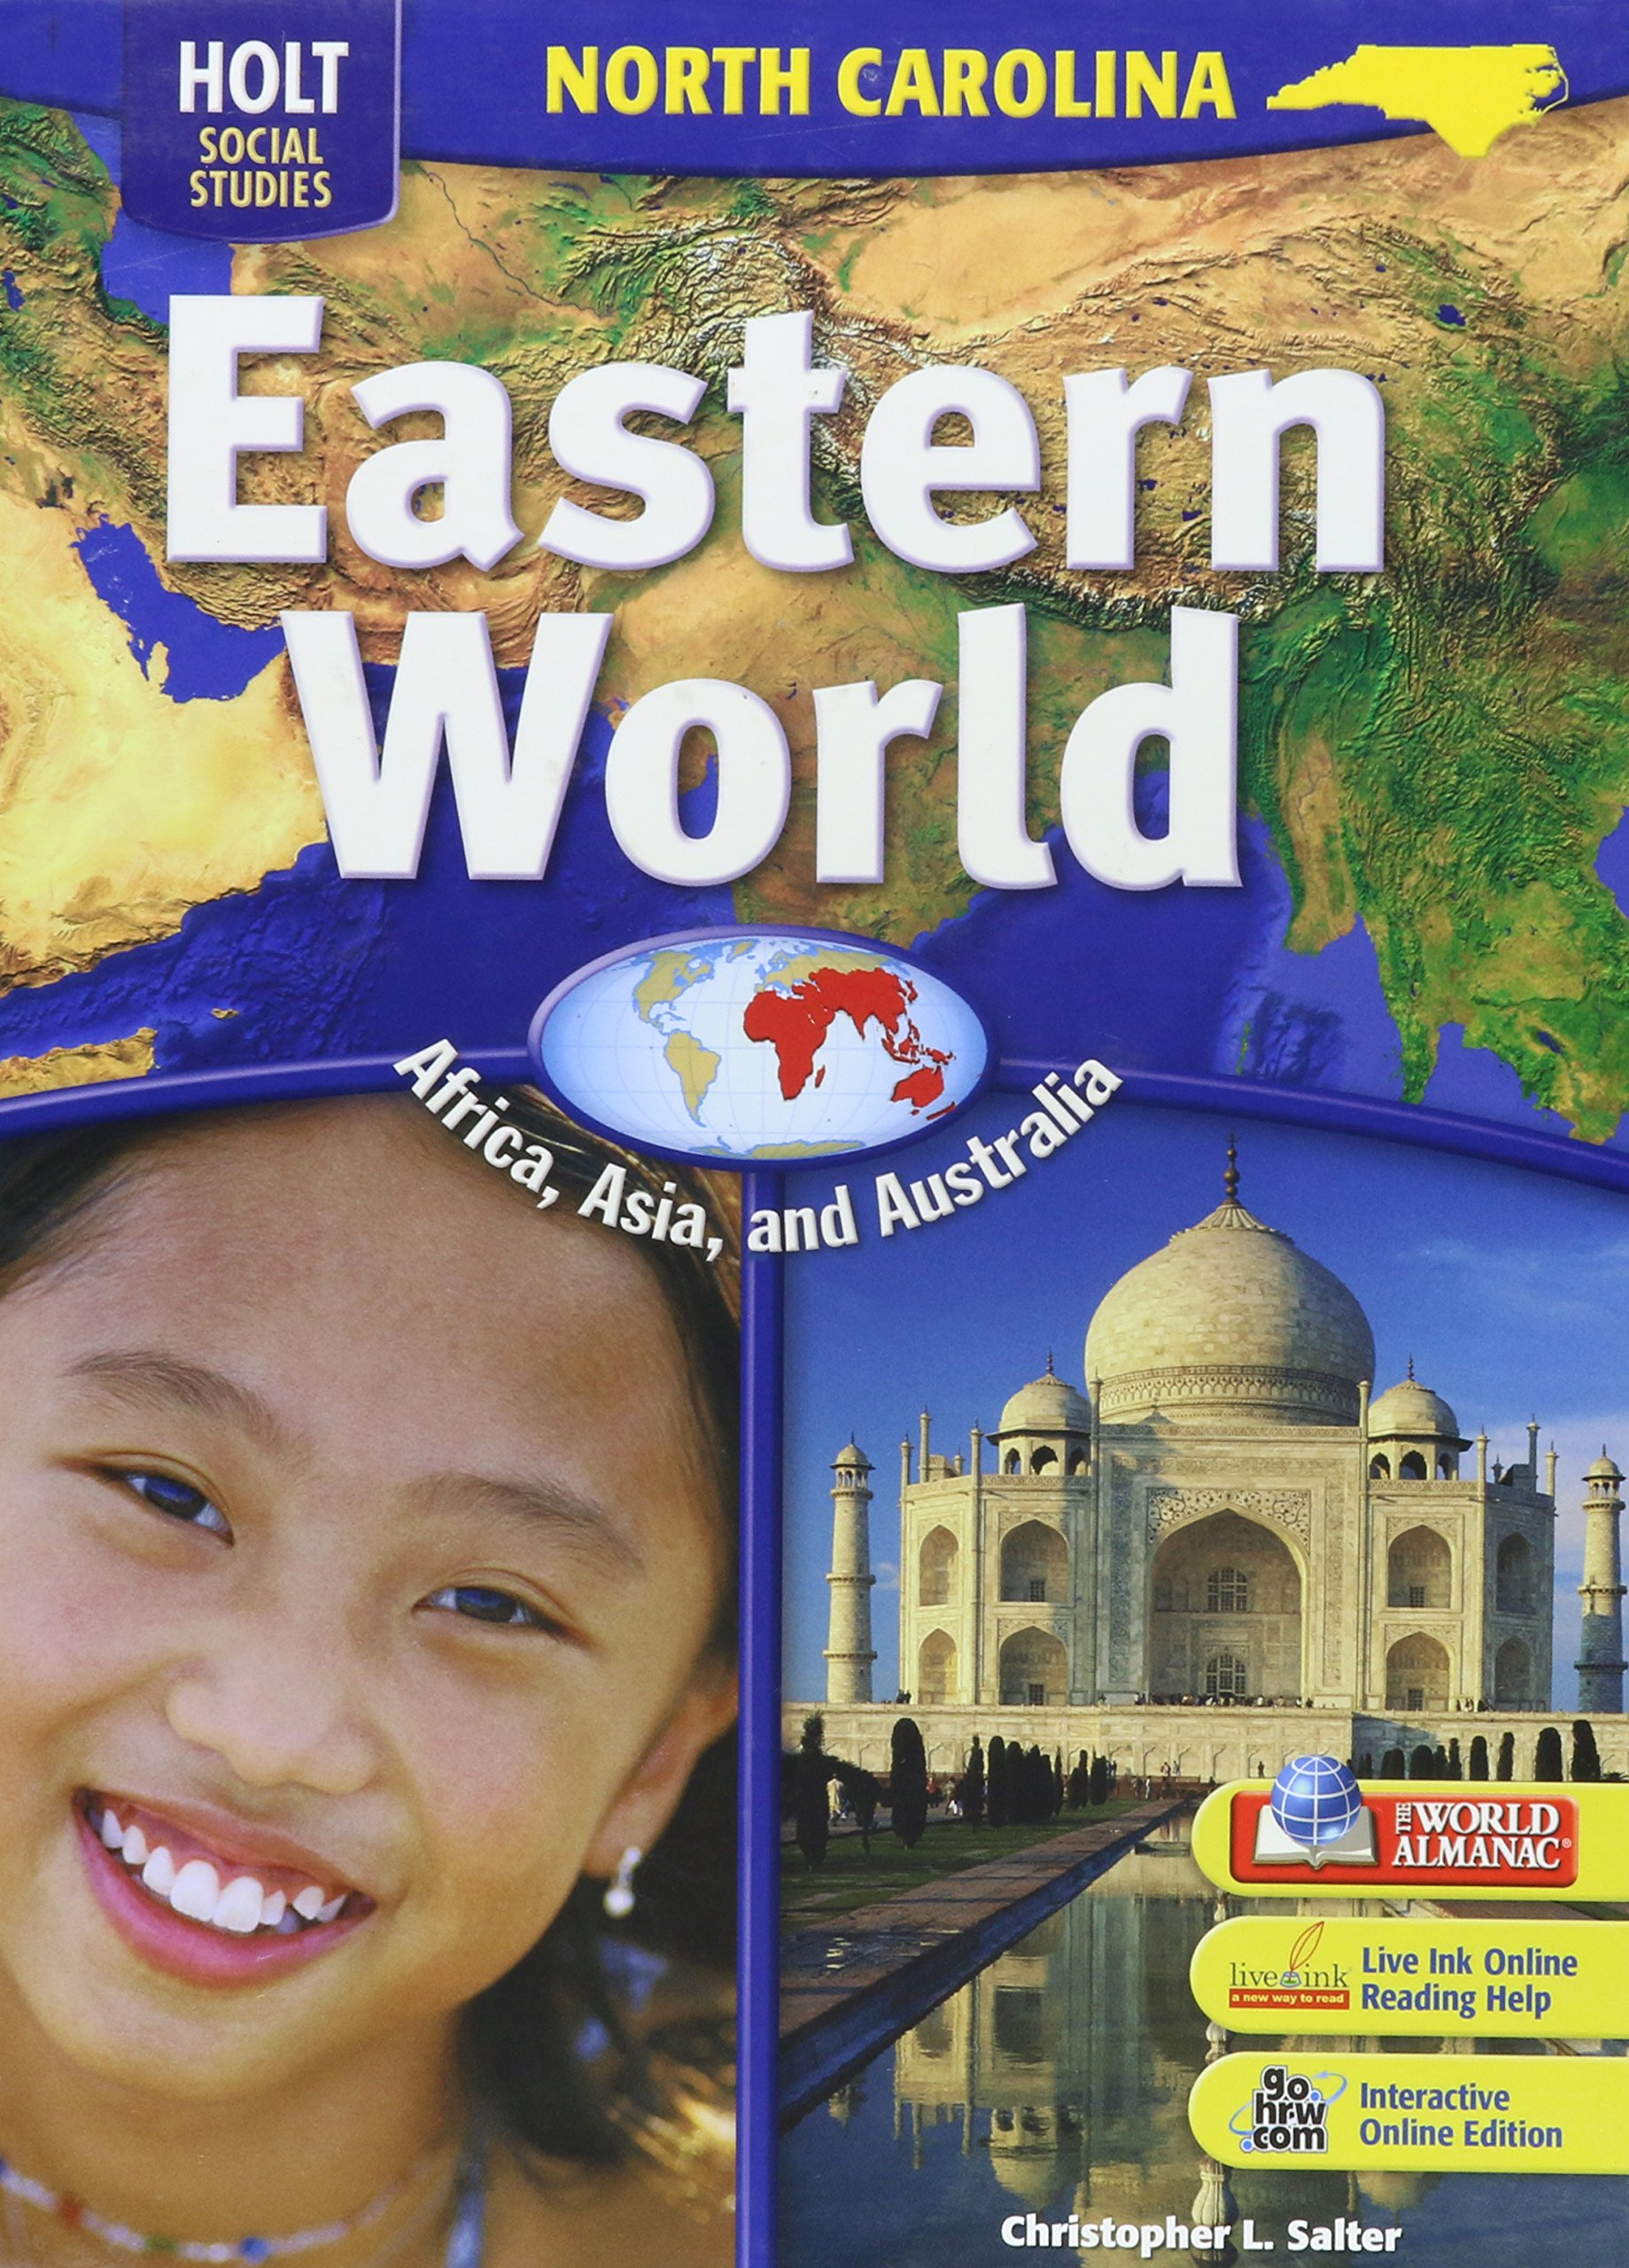 Download Holt Eastern World: Student Edition Grades 6-8 2008 pdf